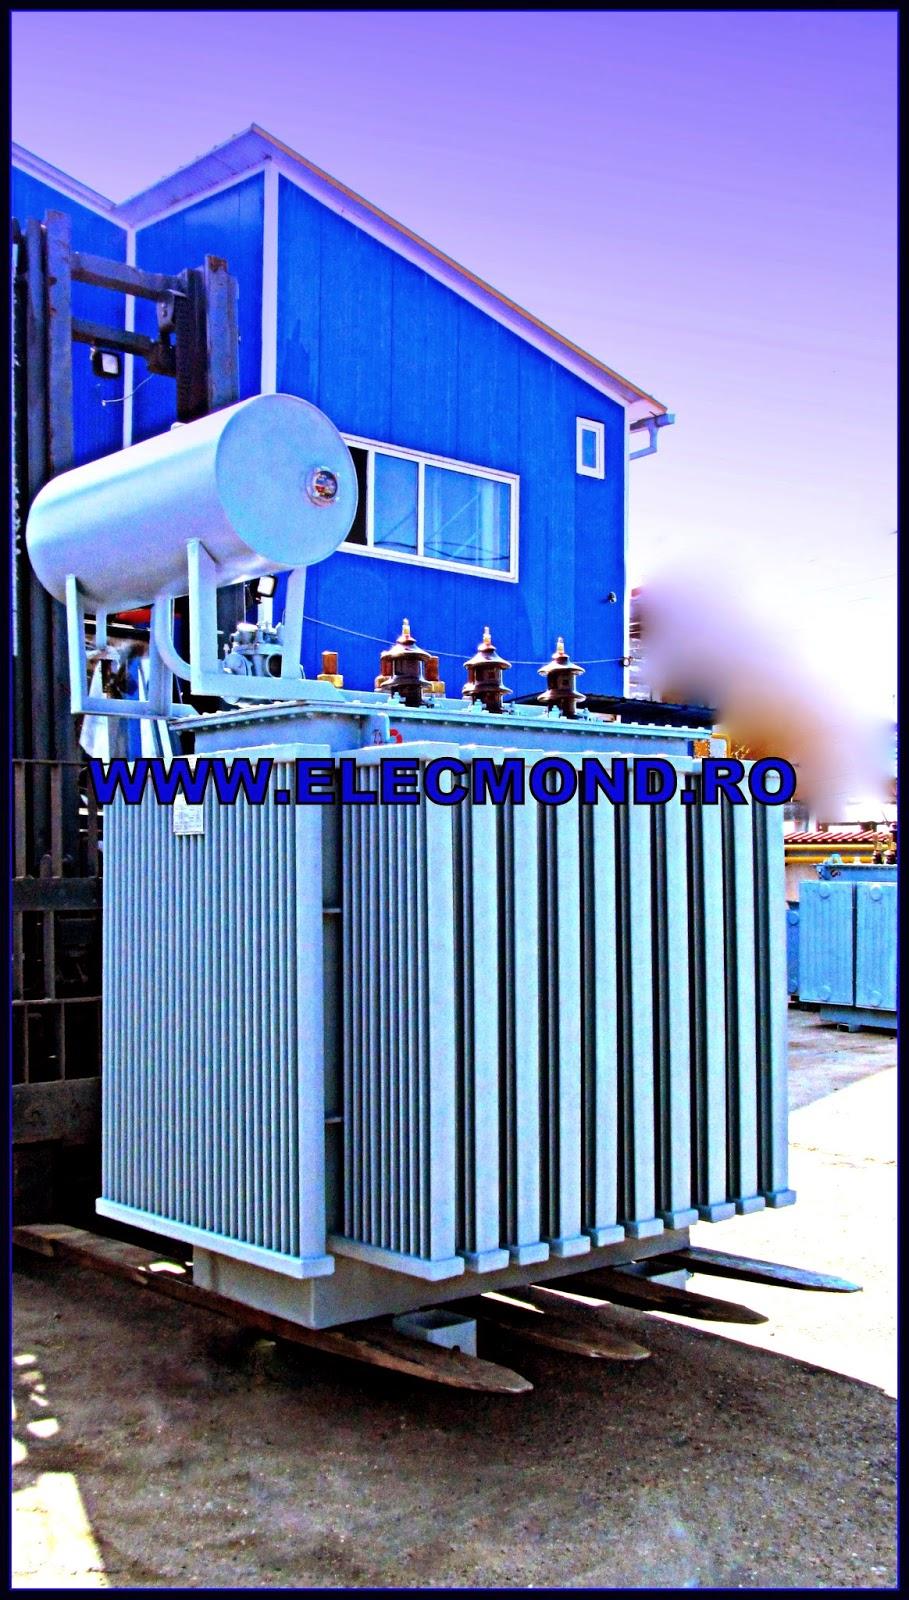 Transformatoare , transformator 1000 kVA transformator 1600 kVA , transformatoare de putere , fabrica transformatoare , reparatii transformatoare , transformator 400 kVA , trafo 1000 , trafo 1600 , trafo 400 kVA , transformator 400 kVA , elecmond  ,